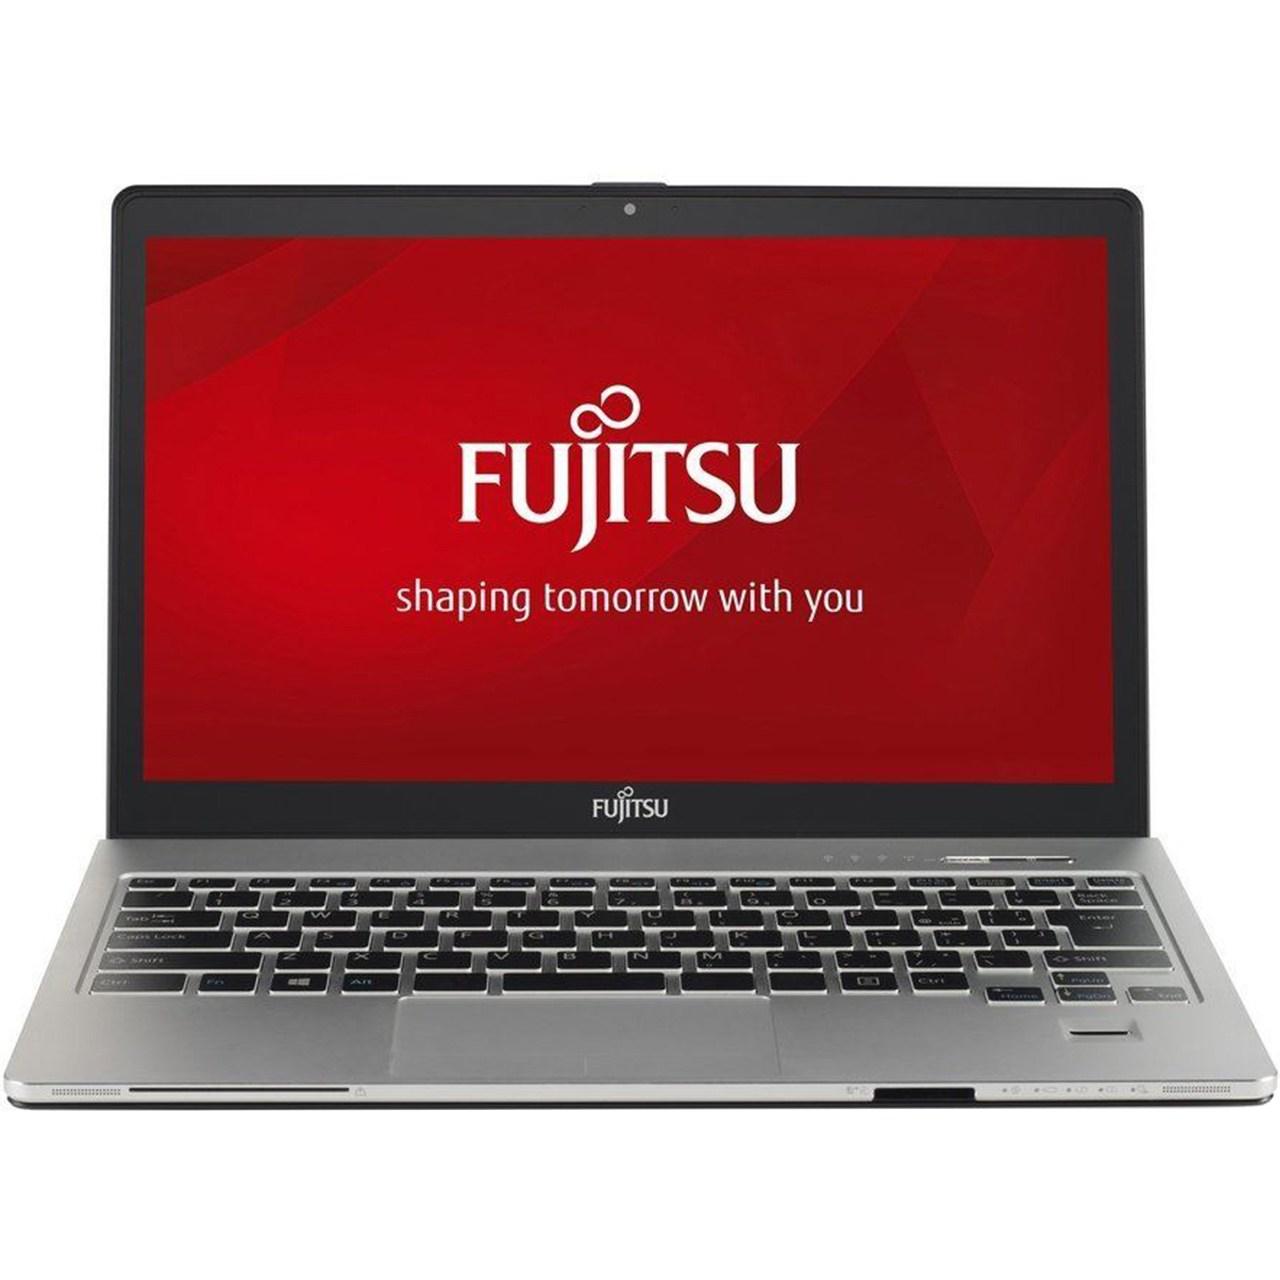 لپ تاپ 13 اینچی فوجیتسو مدل LifeBook S904